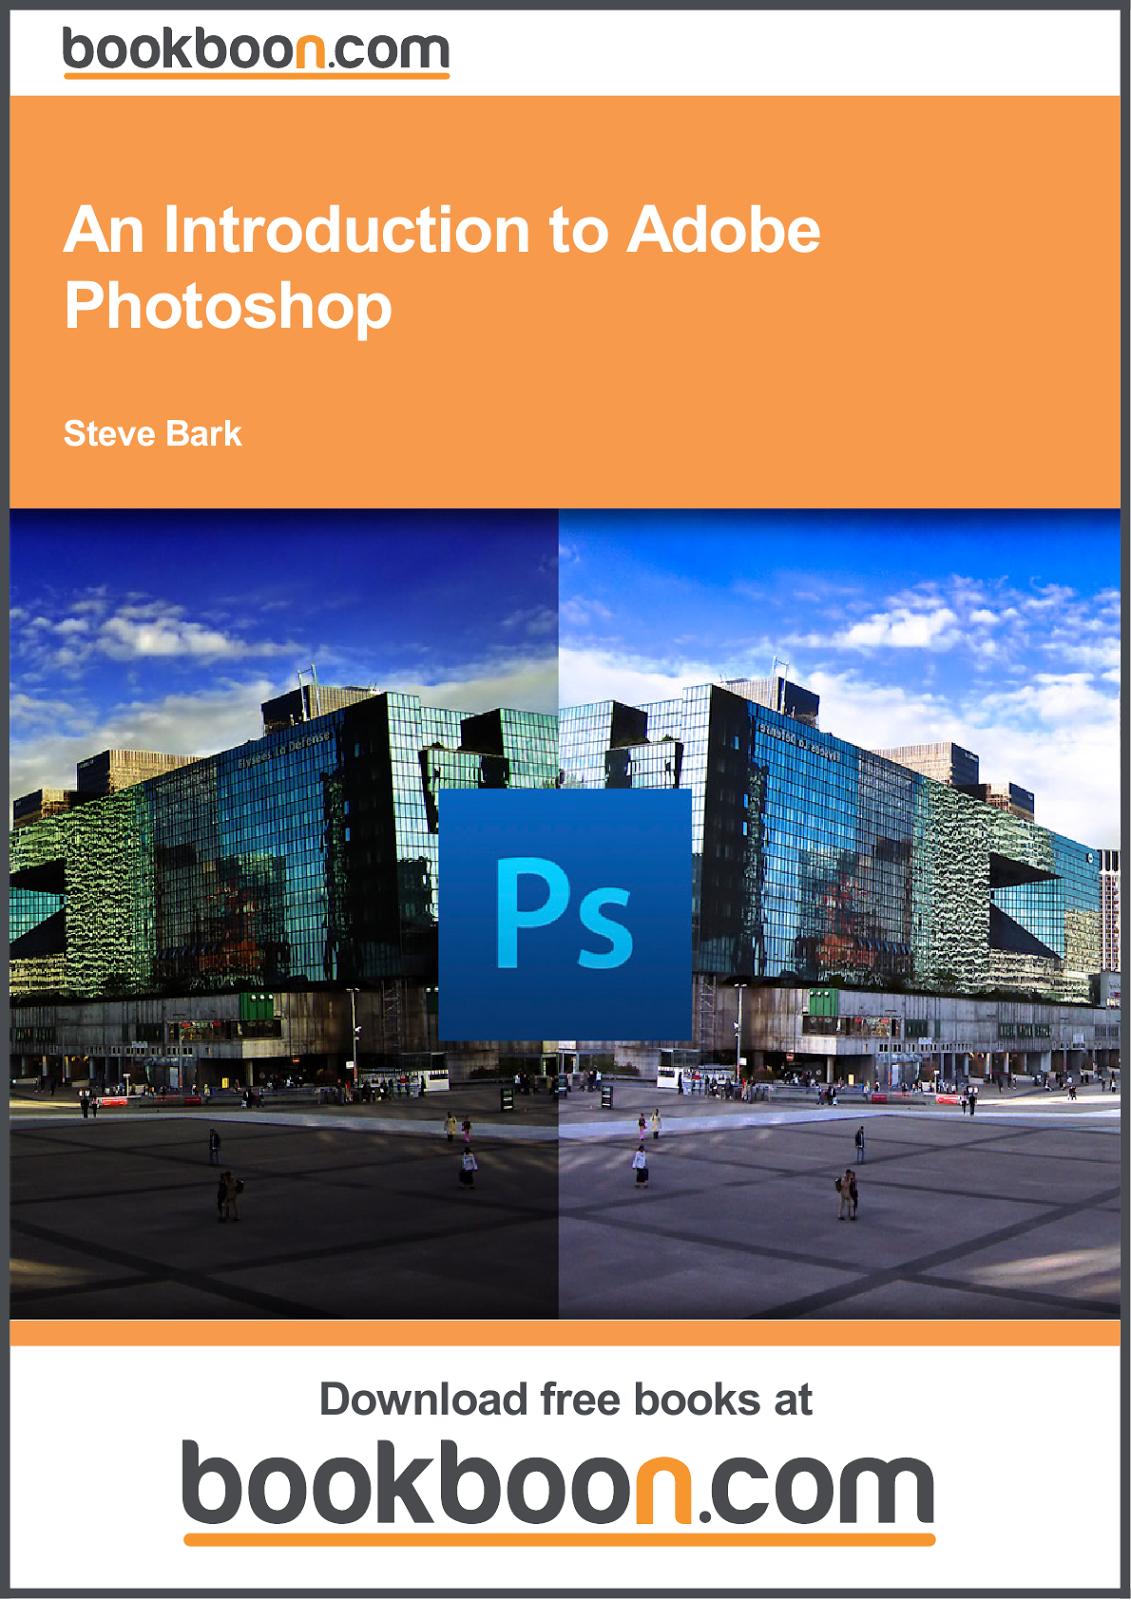 http://www.mediafire.com/view/q39xq1s9w8by9cw/an-introduction-to-adobe-photoshop.pdf